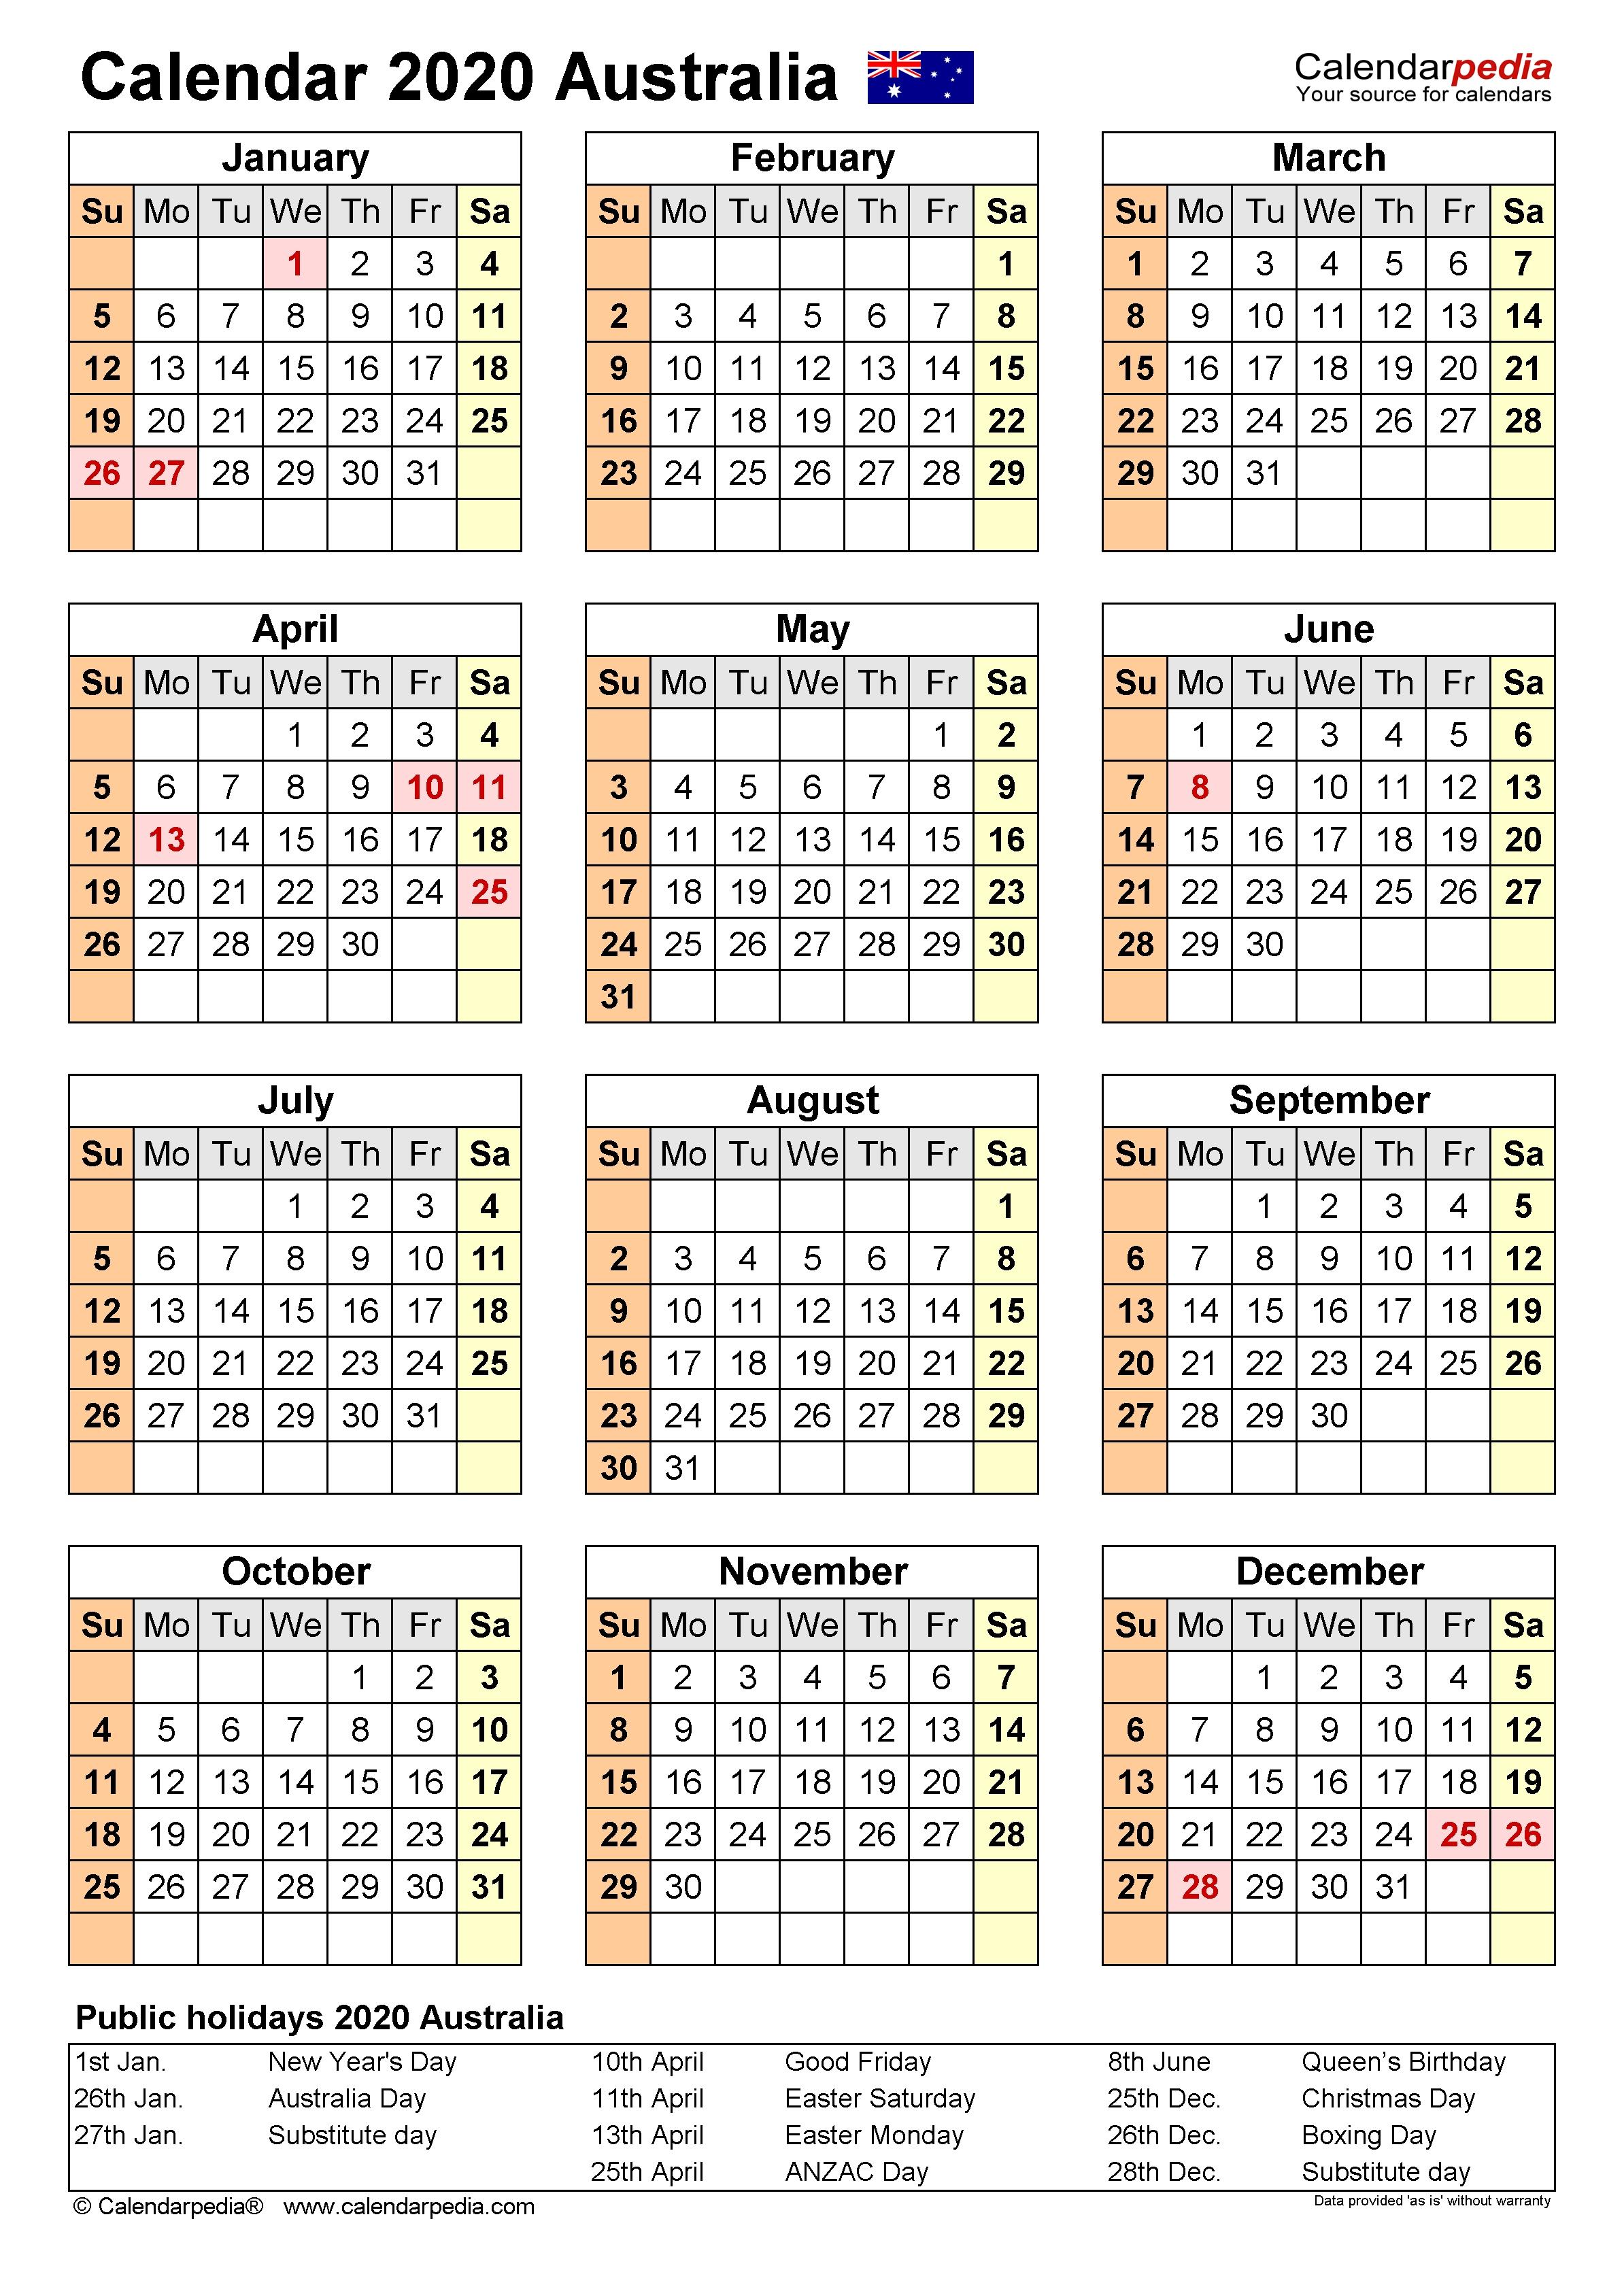 Australia Calendar 2020 - Free Printable Word Templates  Fy 18/19 Calendar Australia